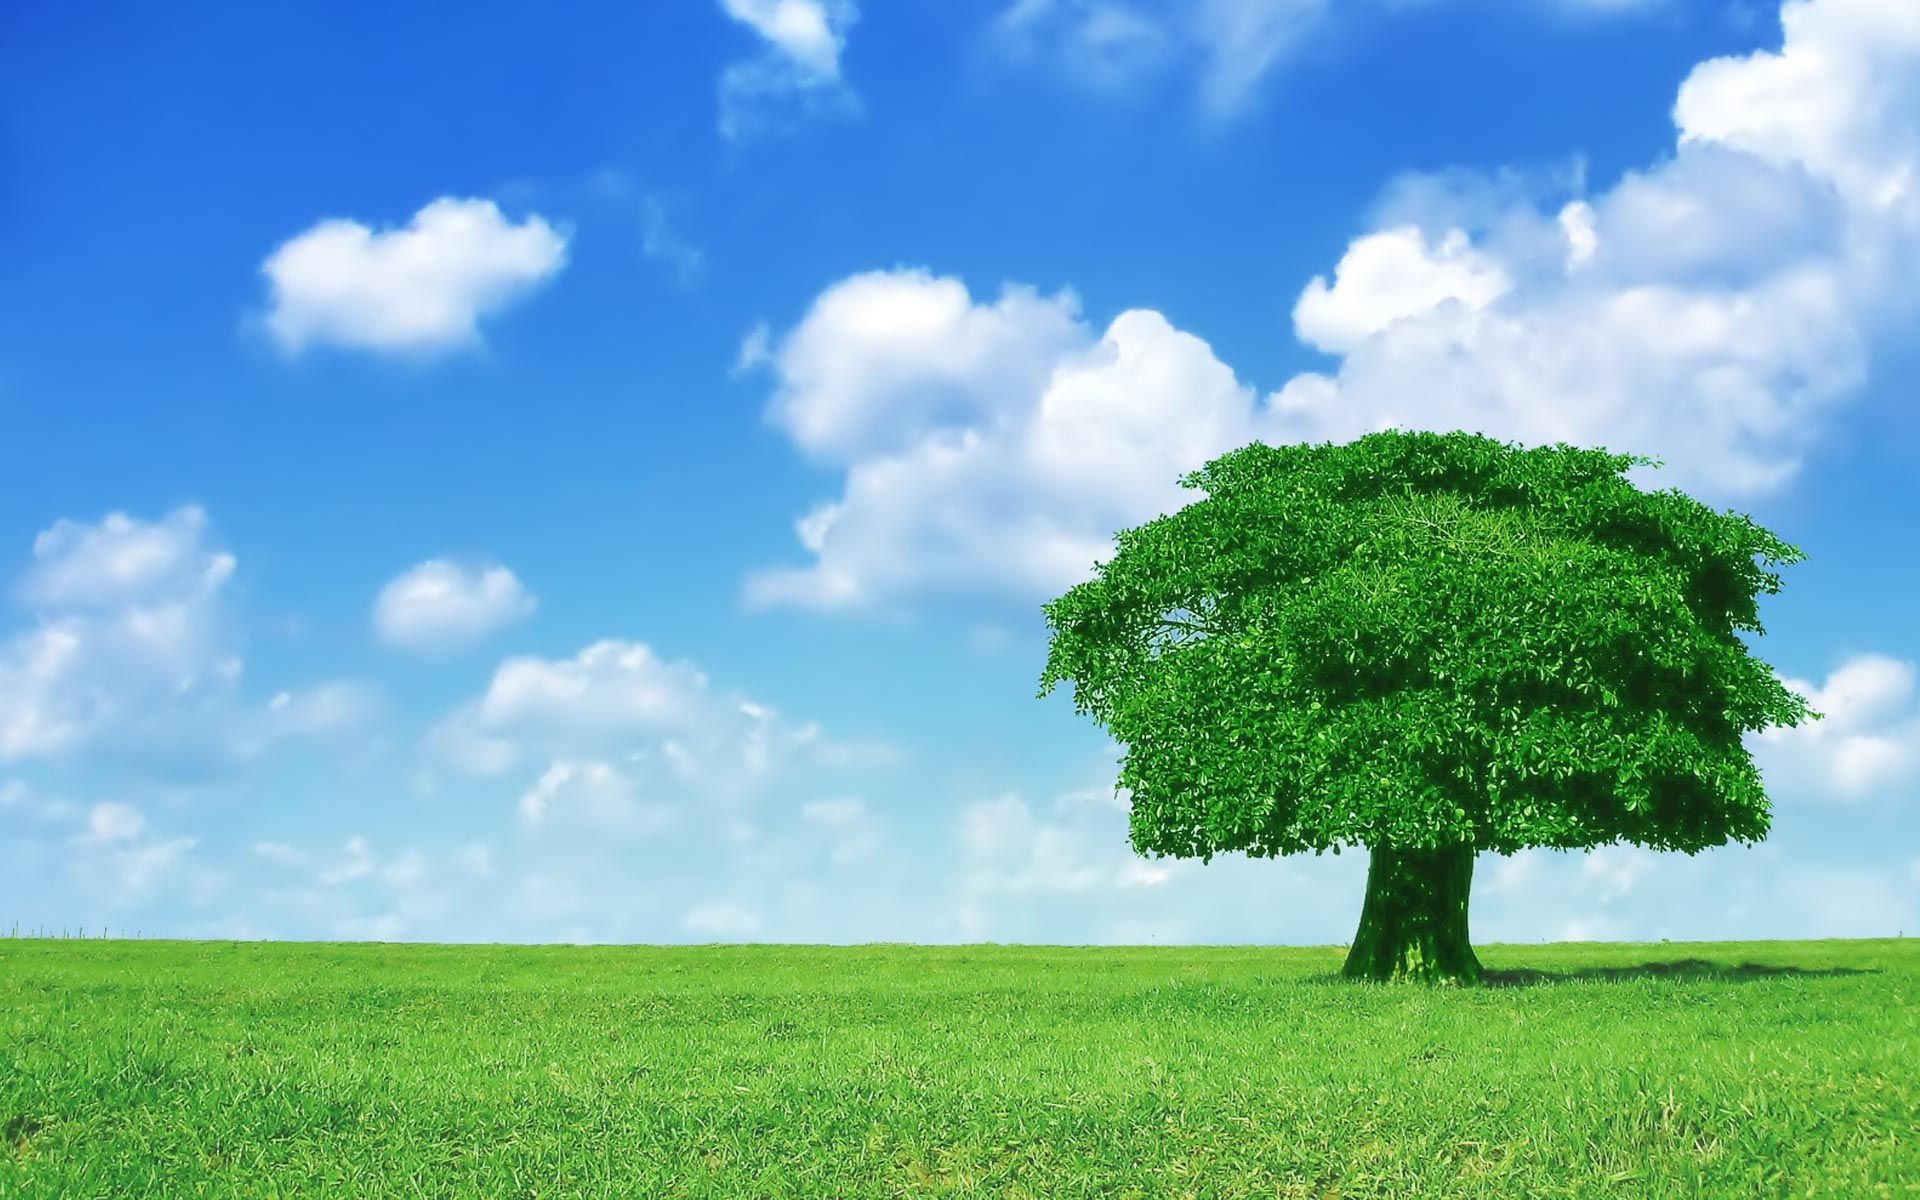 Windows Xp Background Image Tree Hd Wallpaper Green Trees Tree Wallpaper